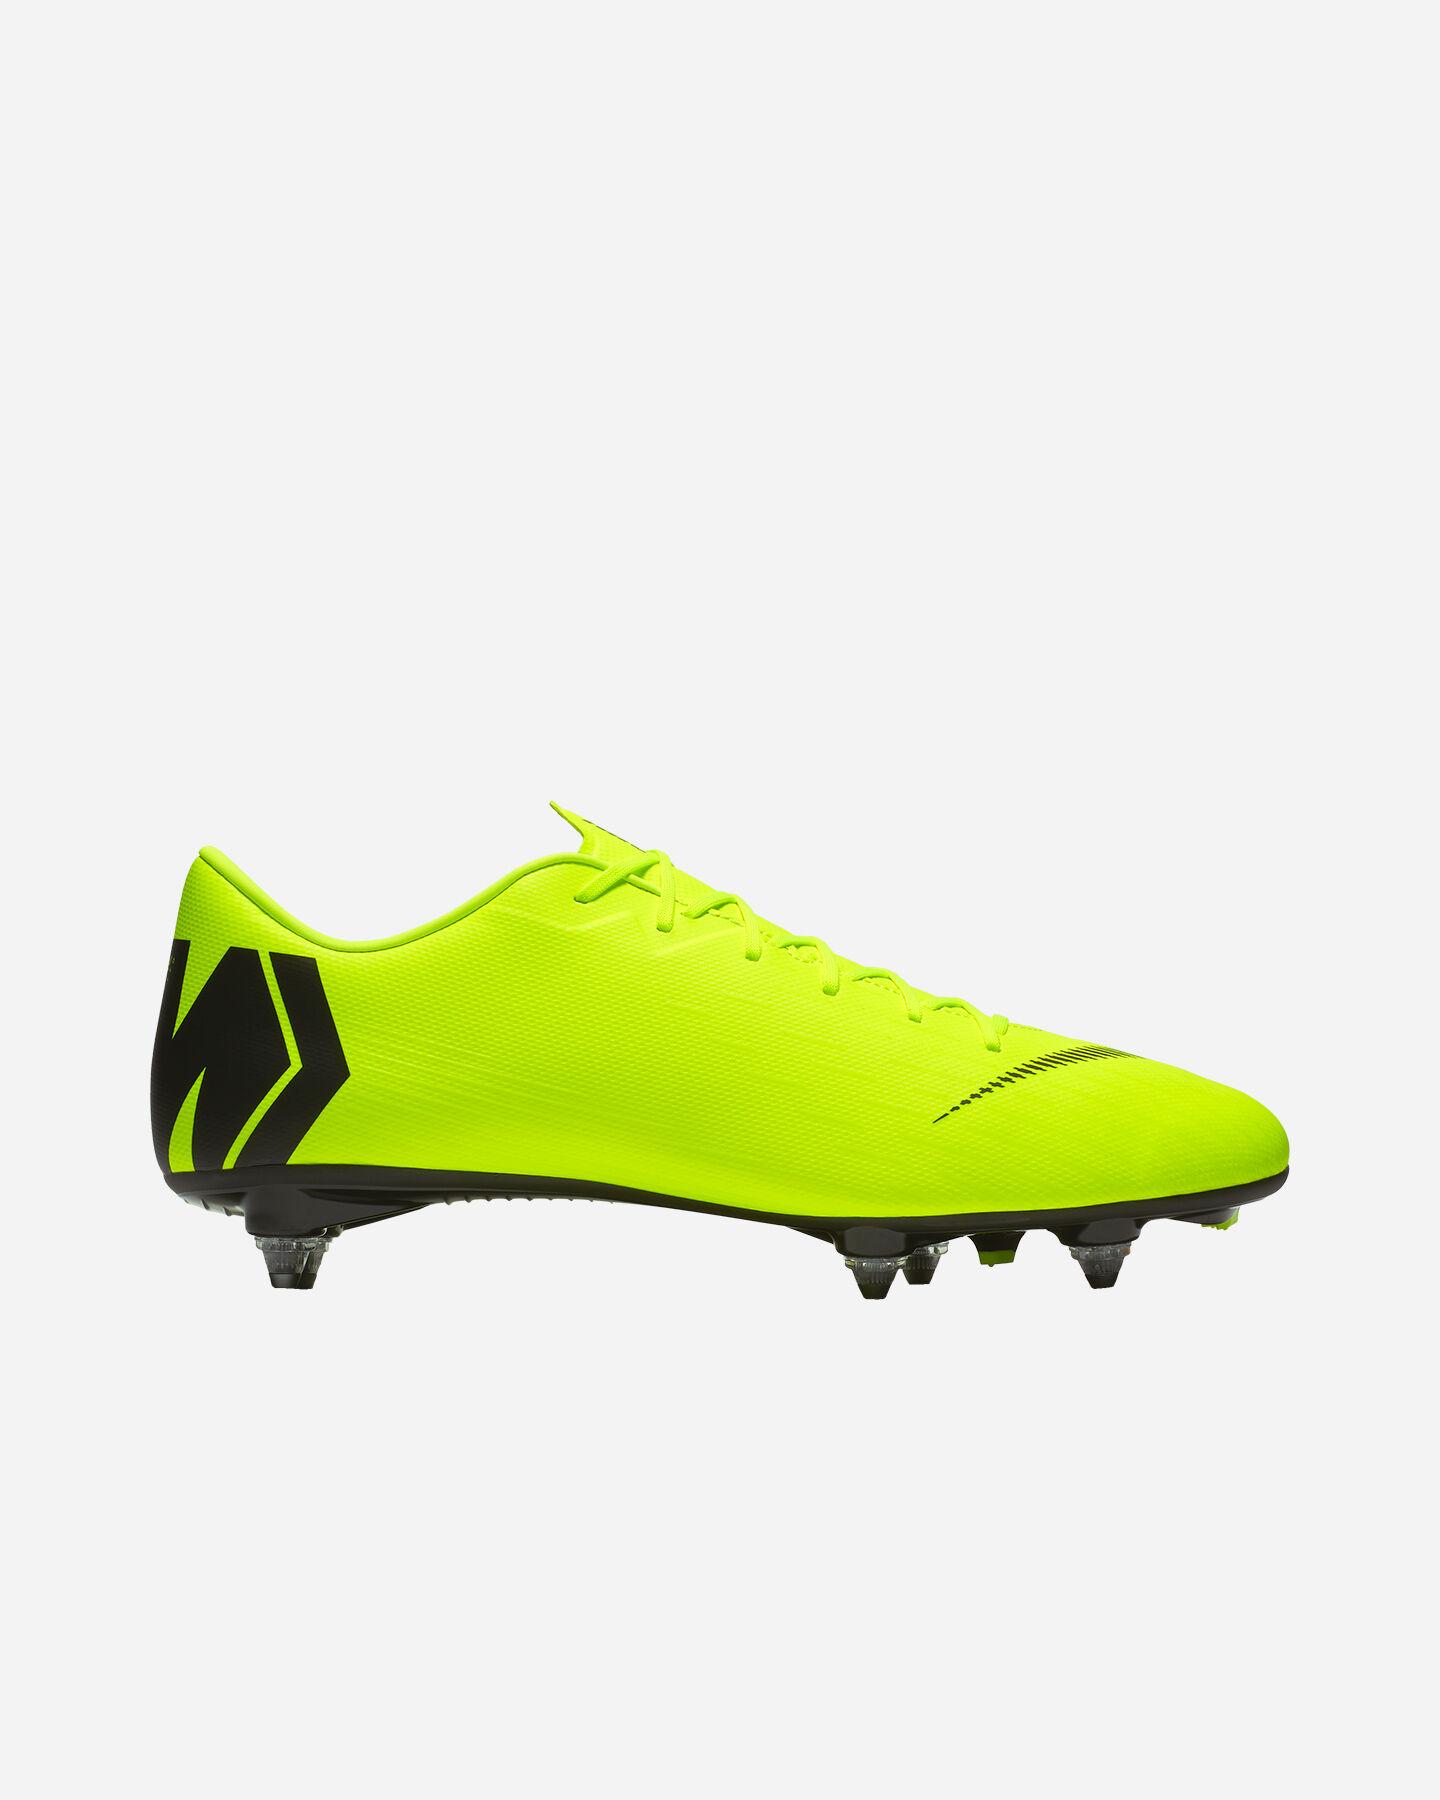 Scarpe Su Rhiw1rqn Cisalfa Calcio Online Sport Nike Da qrnHzqxCU